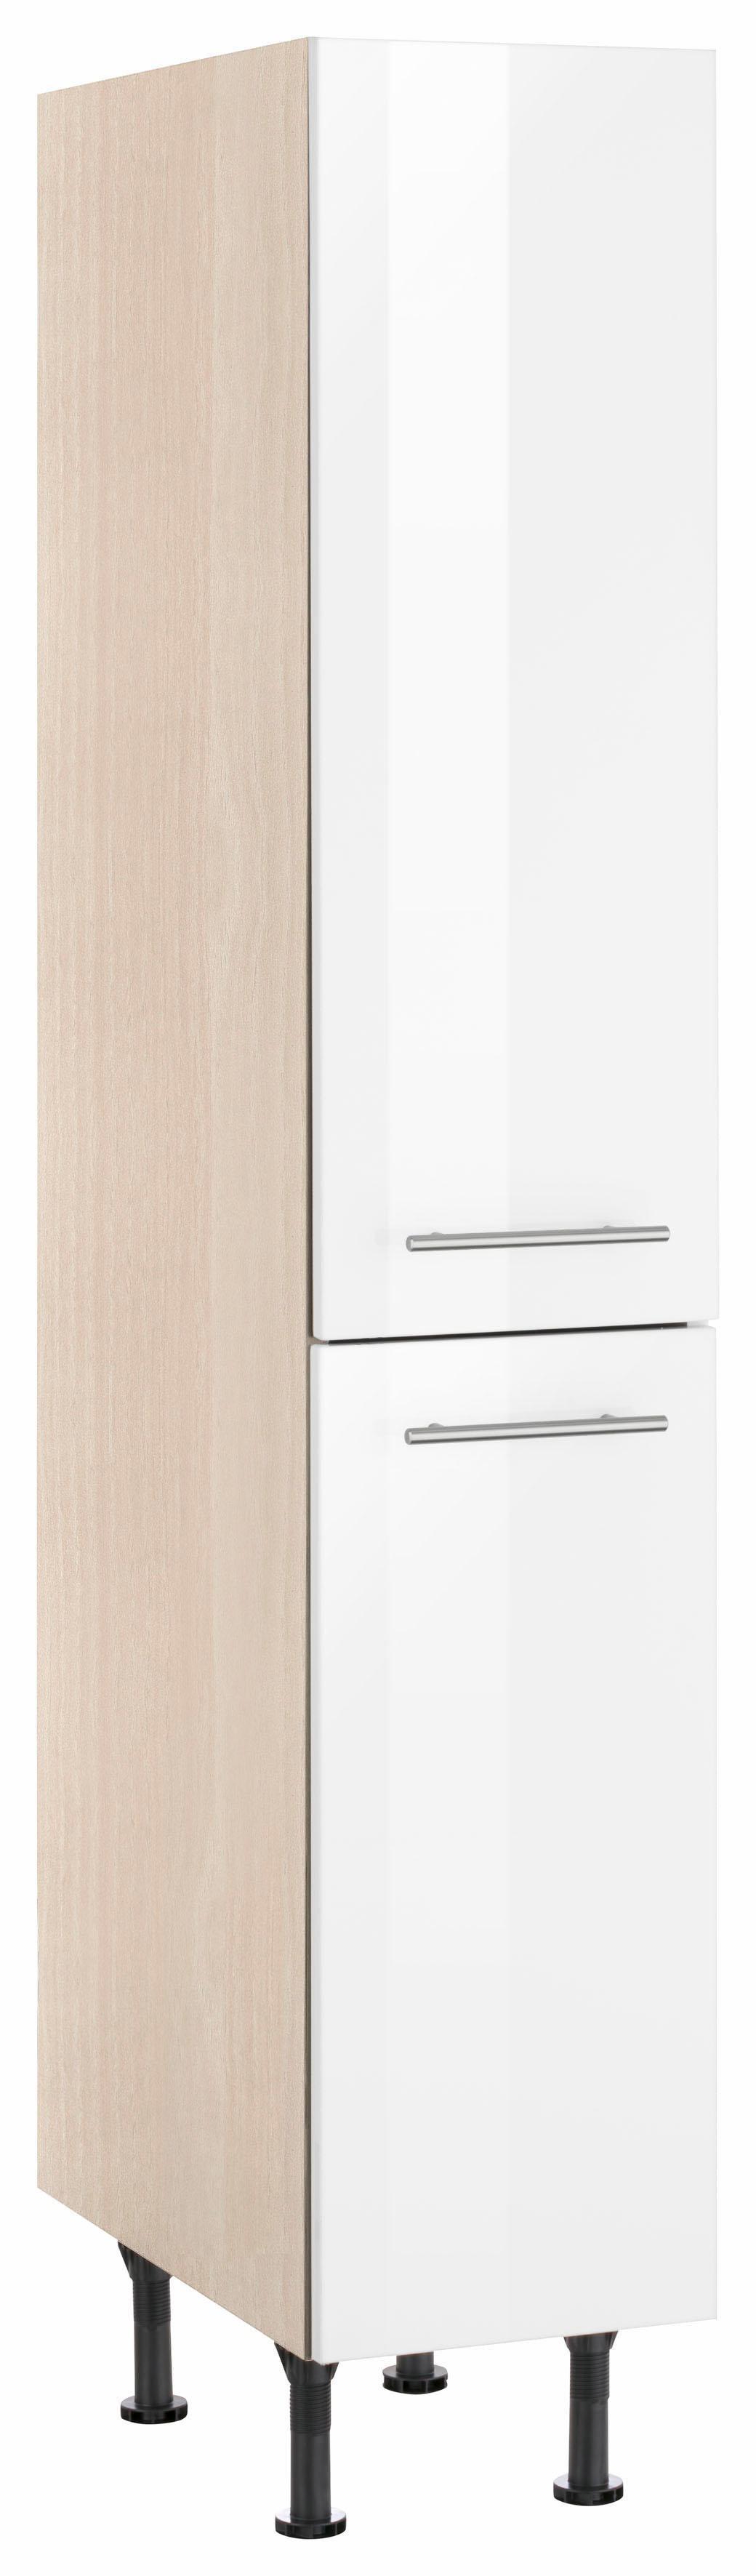 OPTIFIT Apothekerschrank Bern | Küche und Esszimmer > Küchenschränke > Apothekerschränke | Weiß | Nachbildung - Edelstahl - Melamin | Optifit